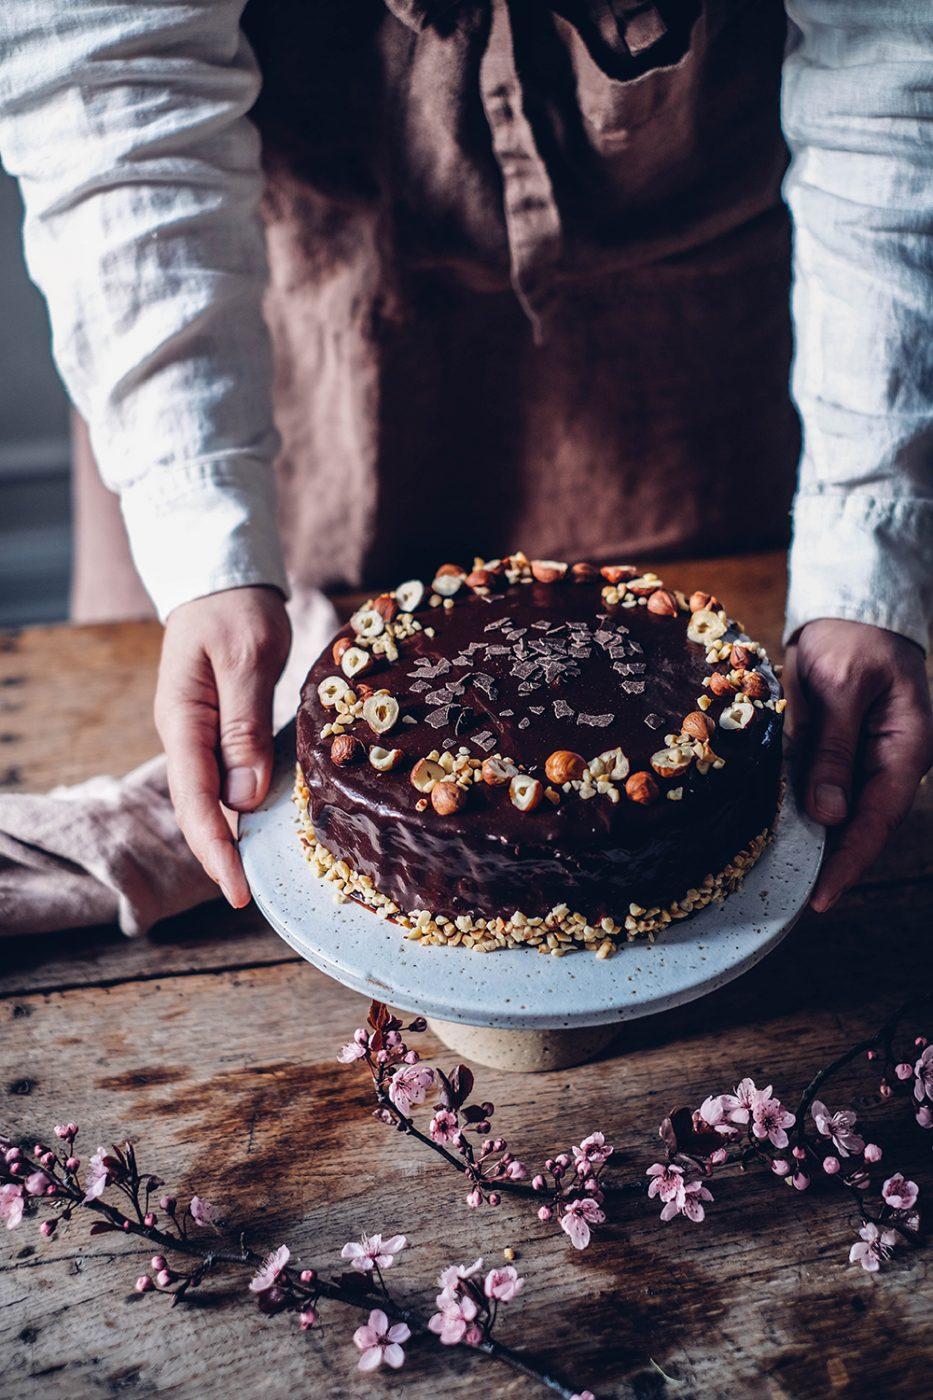 glutenfree chocolate cake